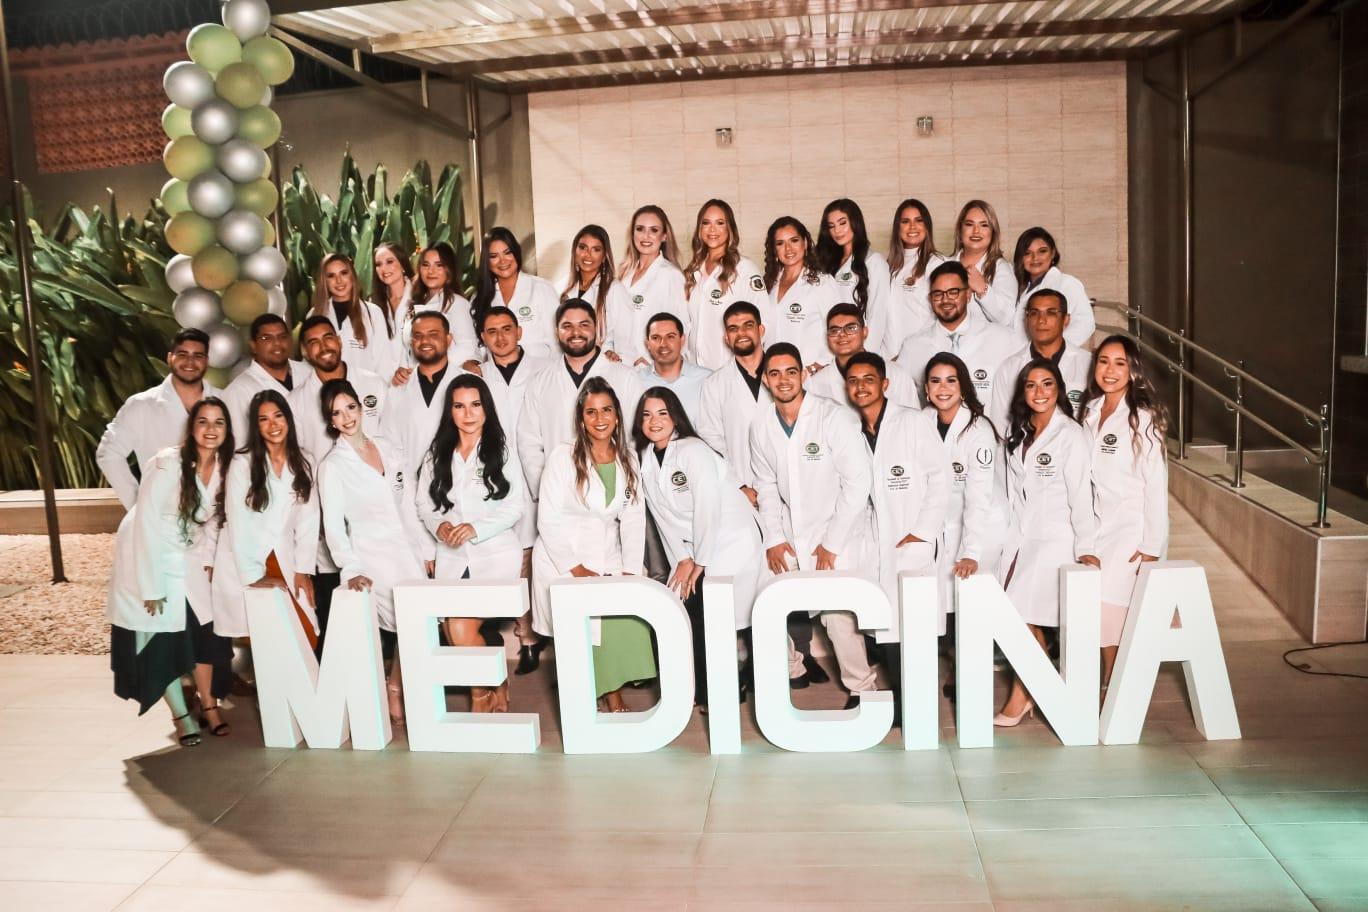 Medicina-file_0510202106351010.jpeg